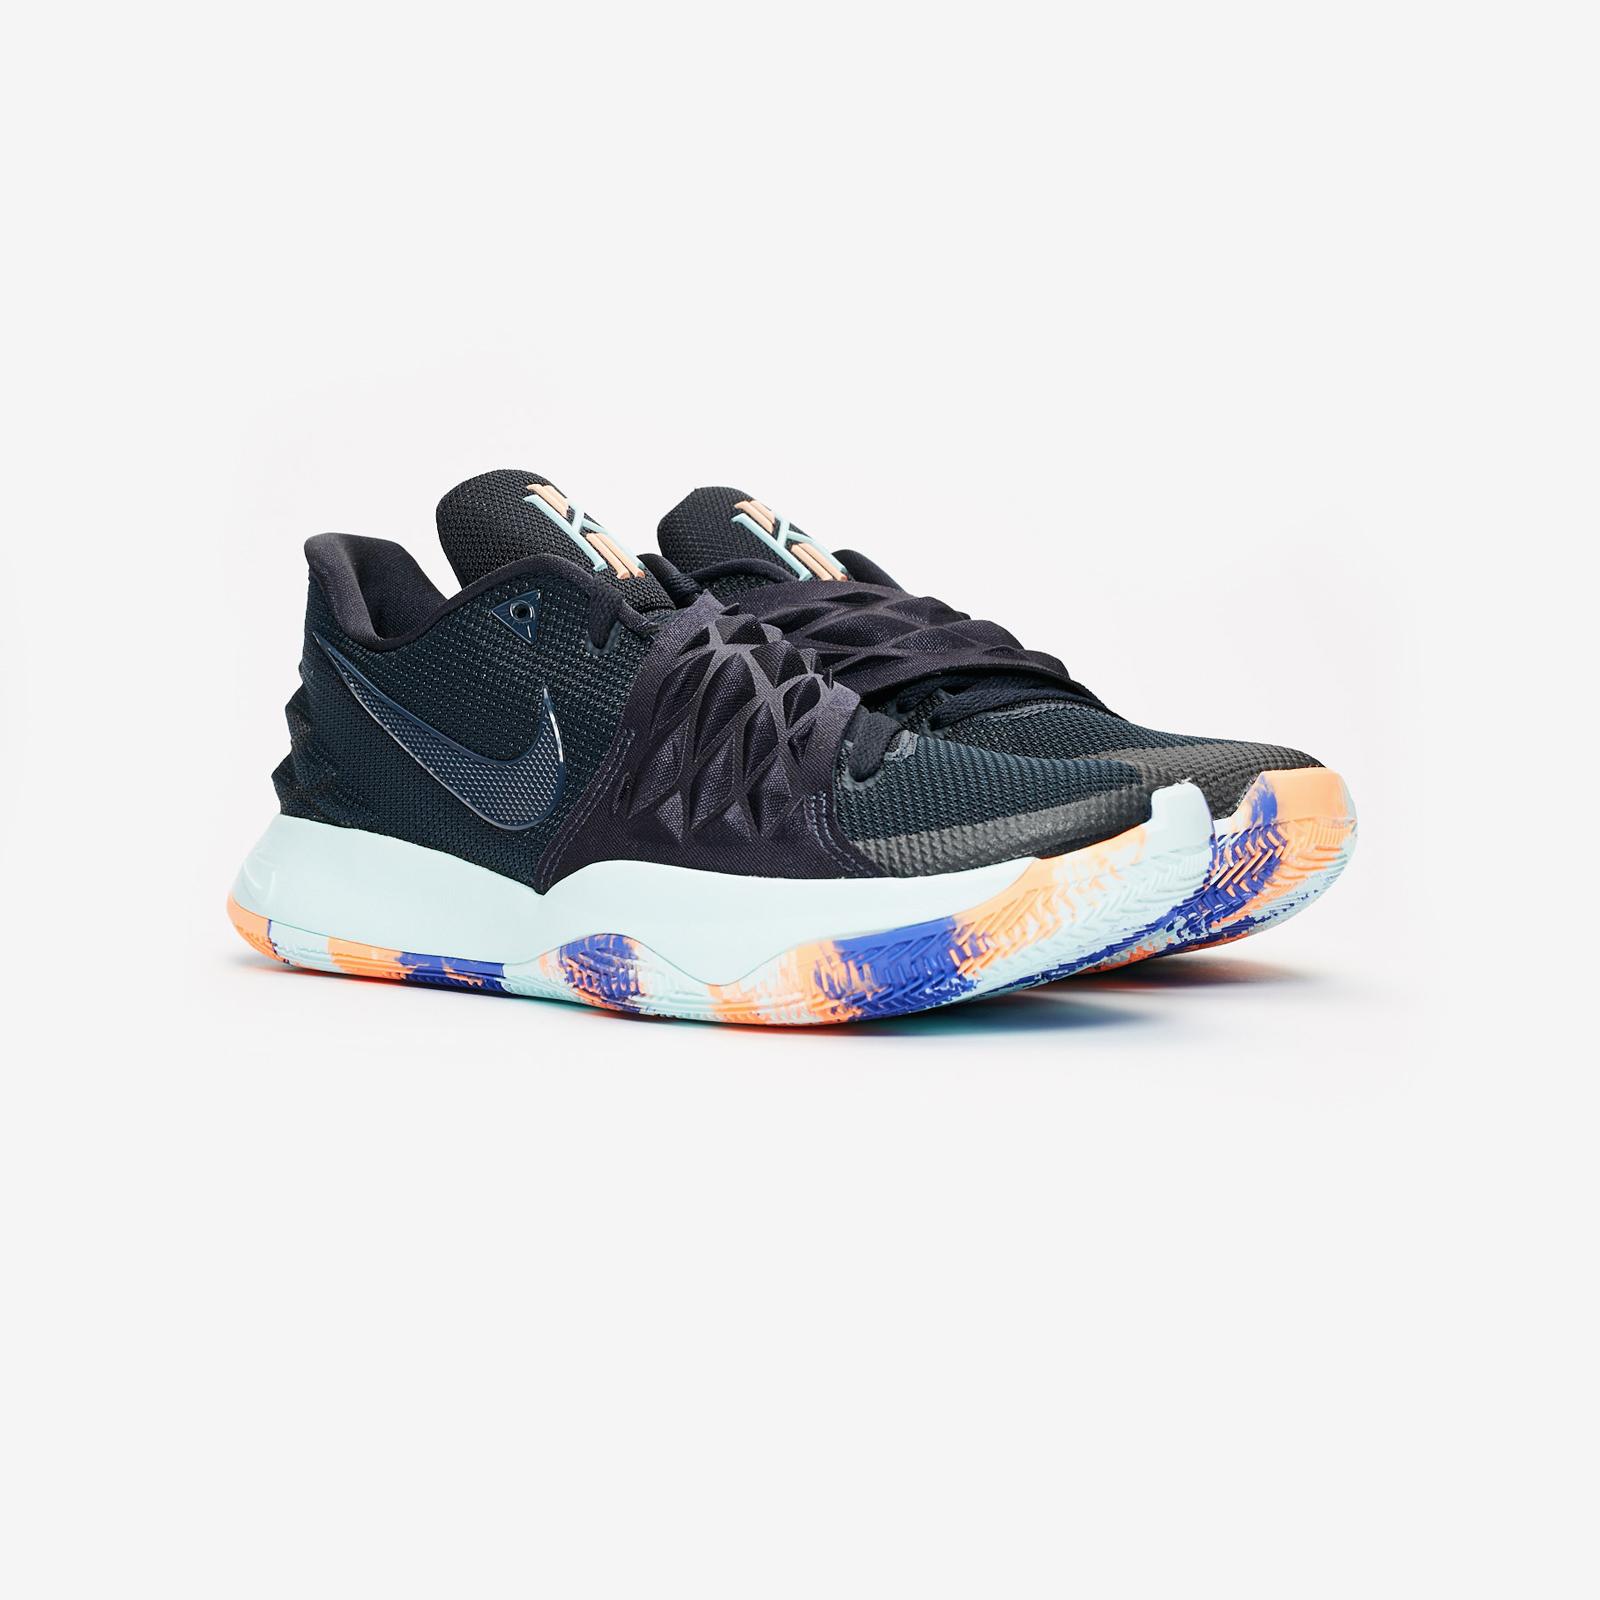 Nike Kyrie Low - Ao8979-402 - Sneakersnstuff  8d3e0da68